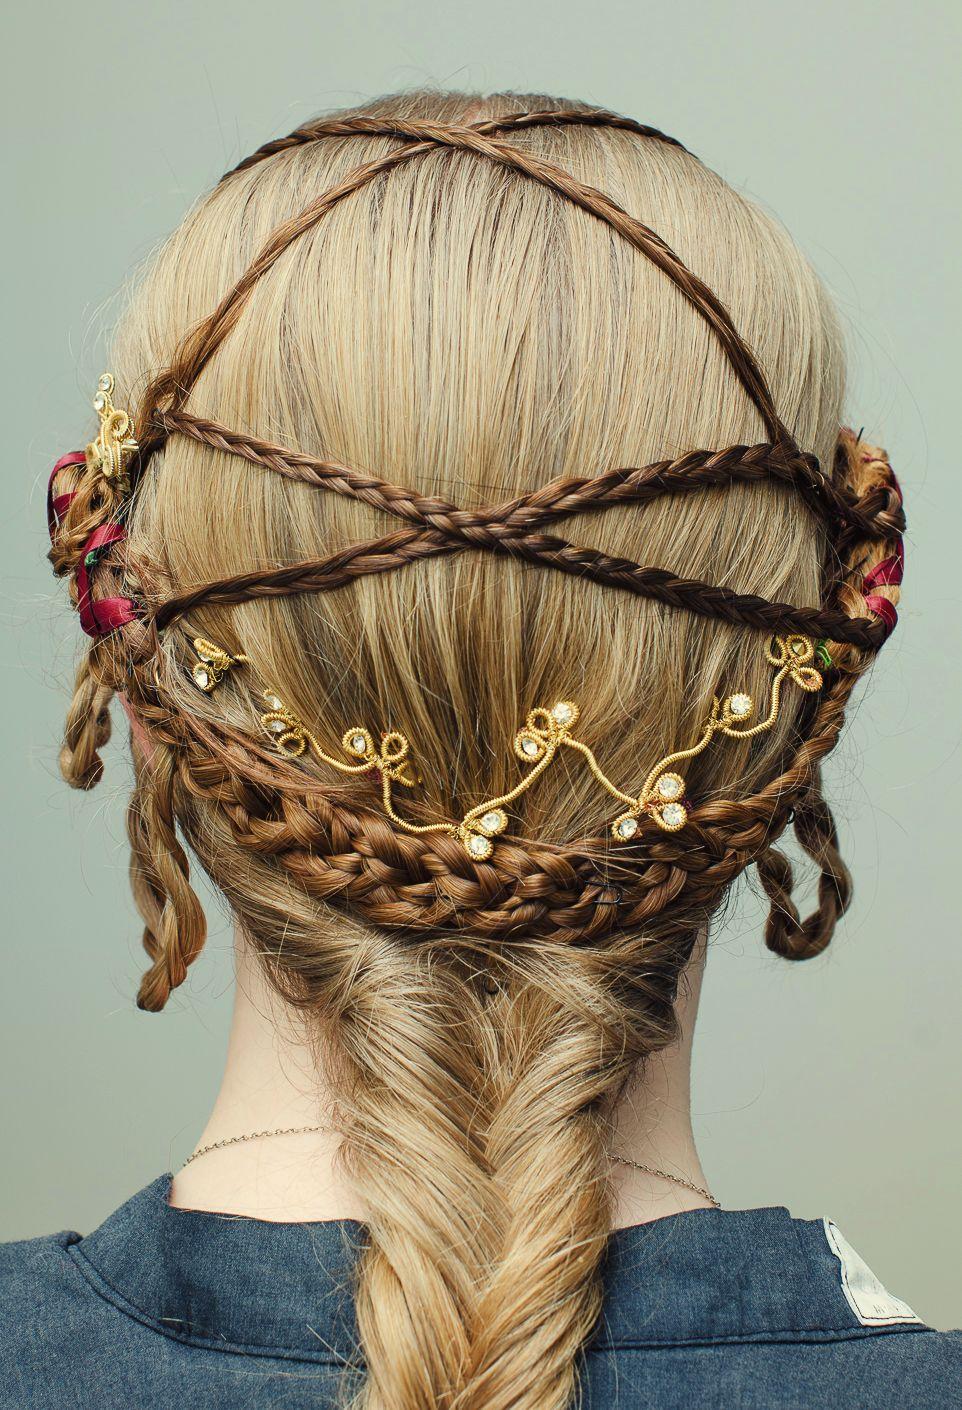 December 2013 Cardiff   Fairy hair, Medieval hairstyles ...